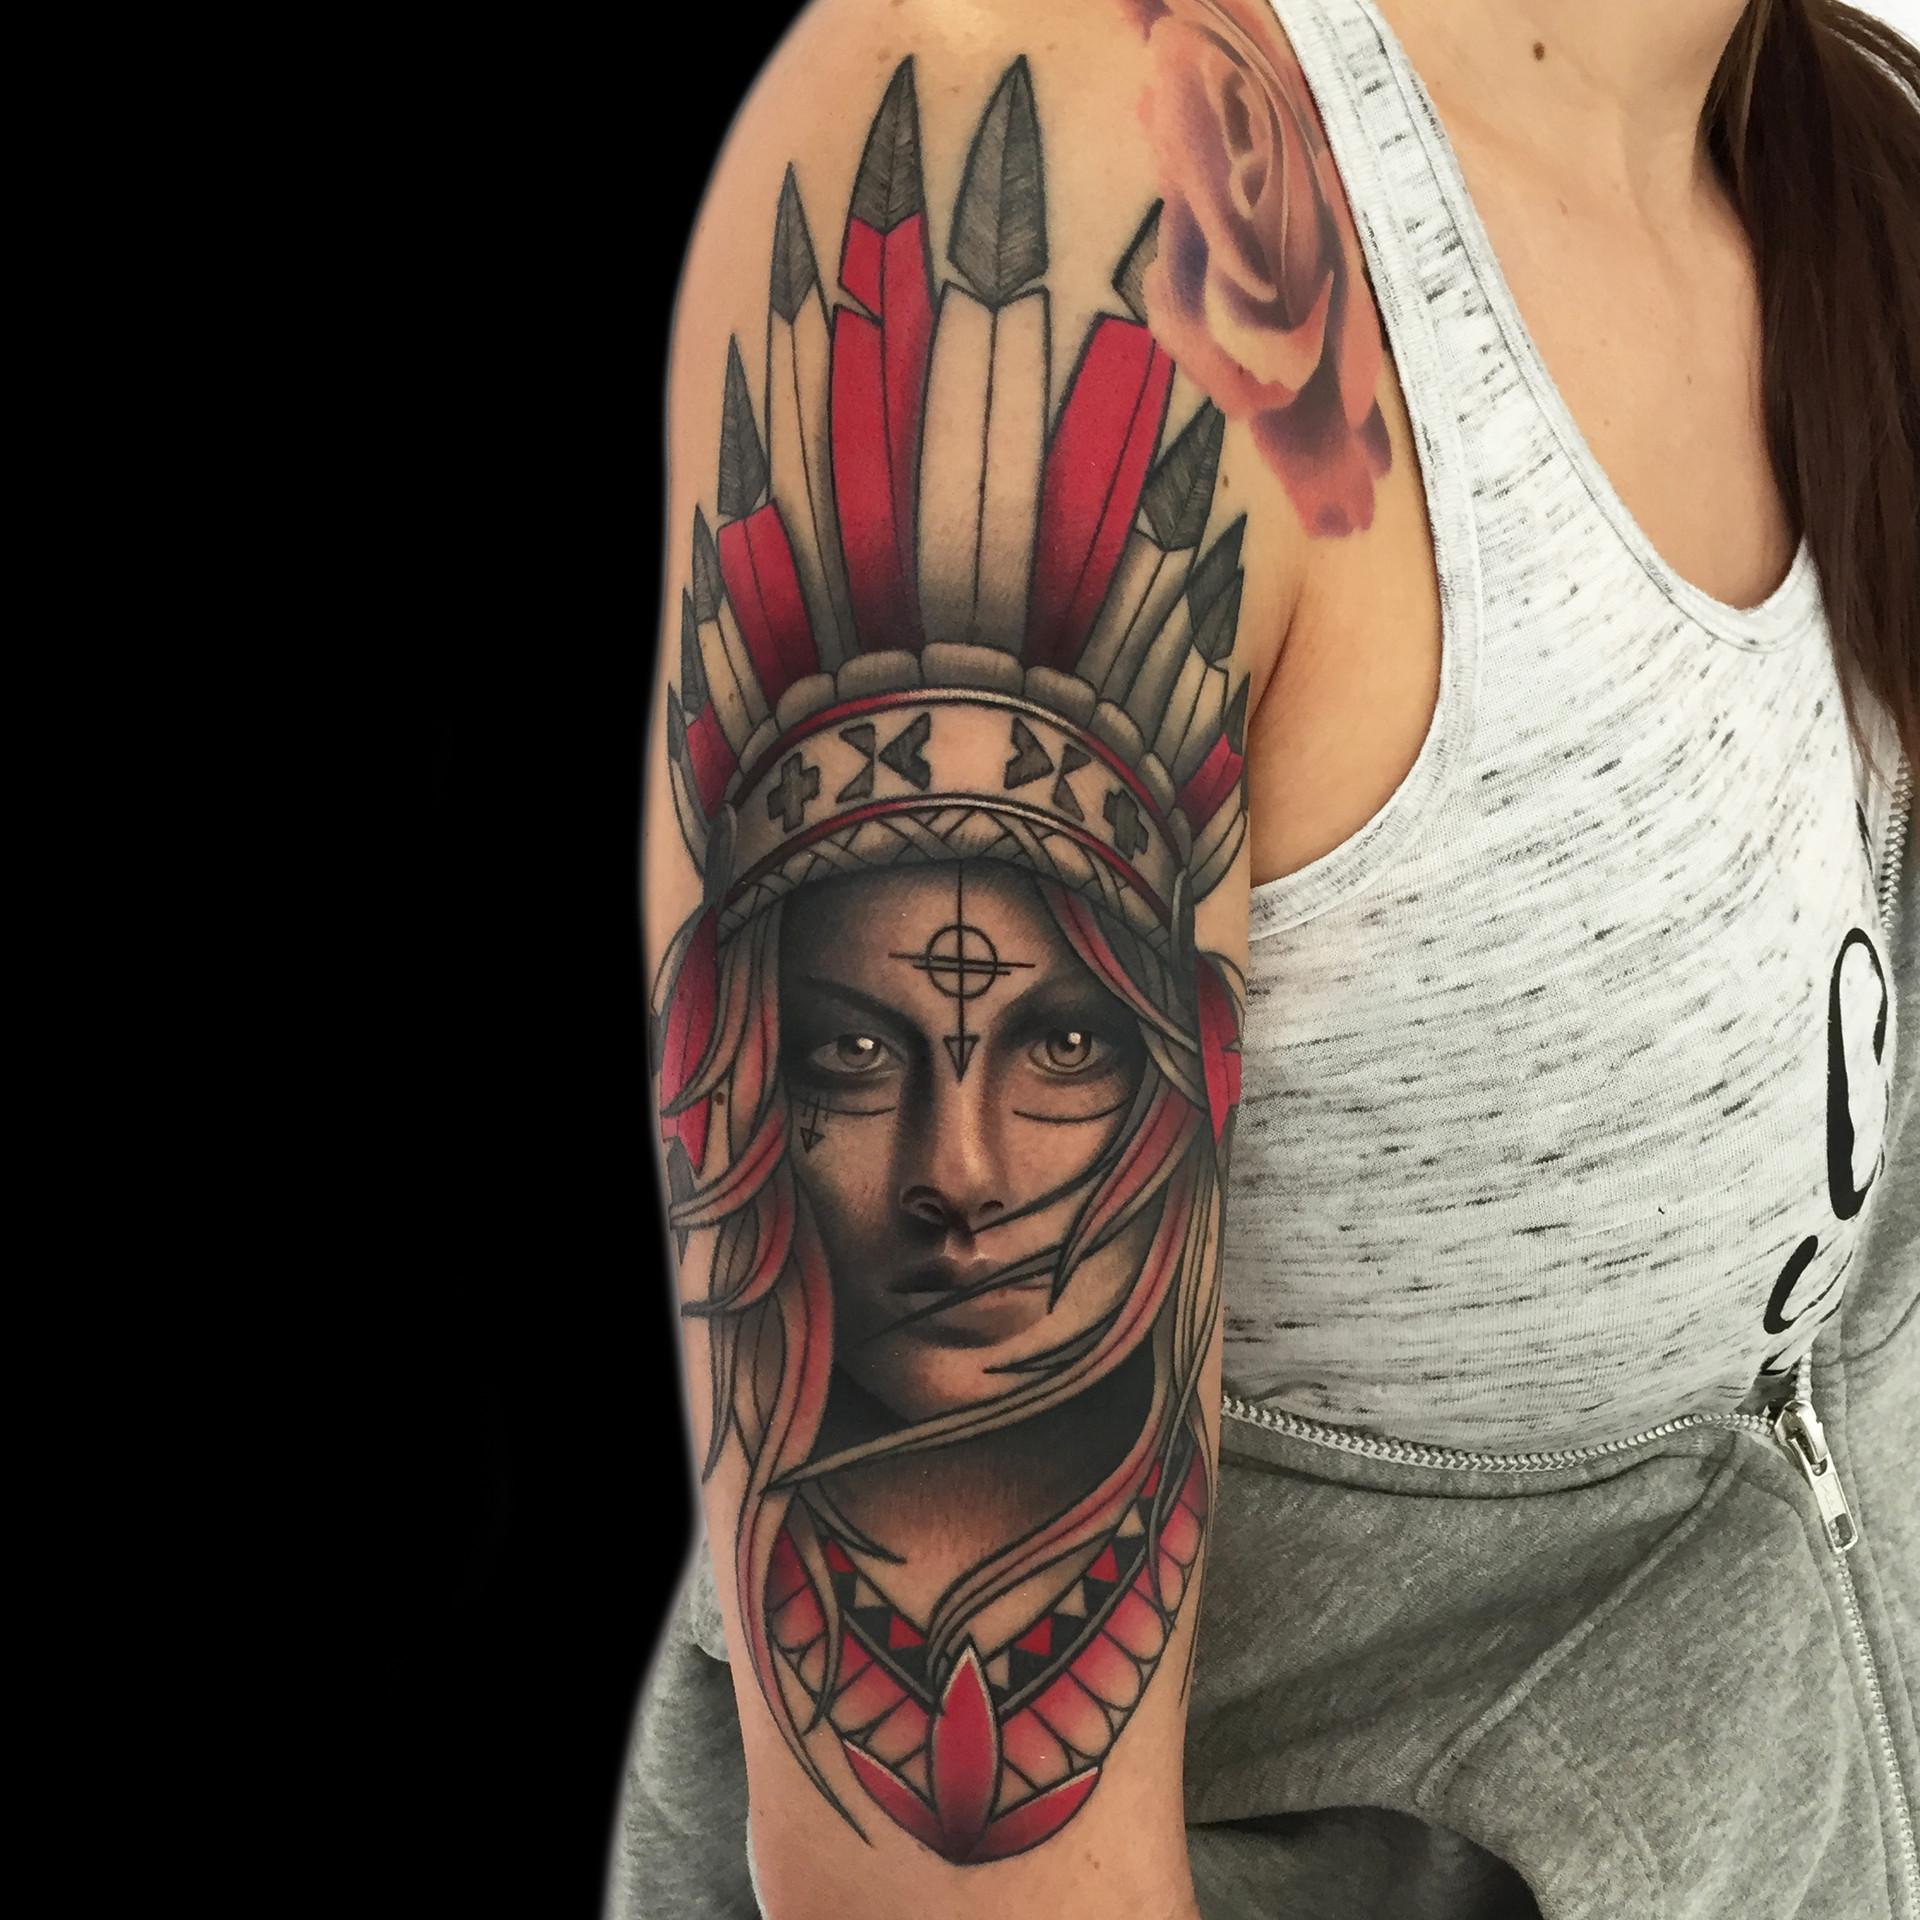 Chris_Hautundliebe_Tattoo_Indianlady.jpg